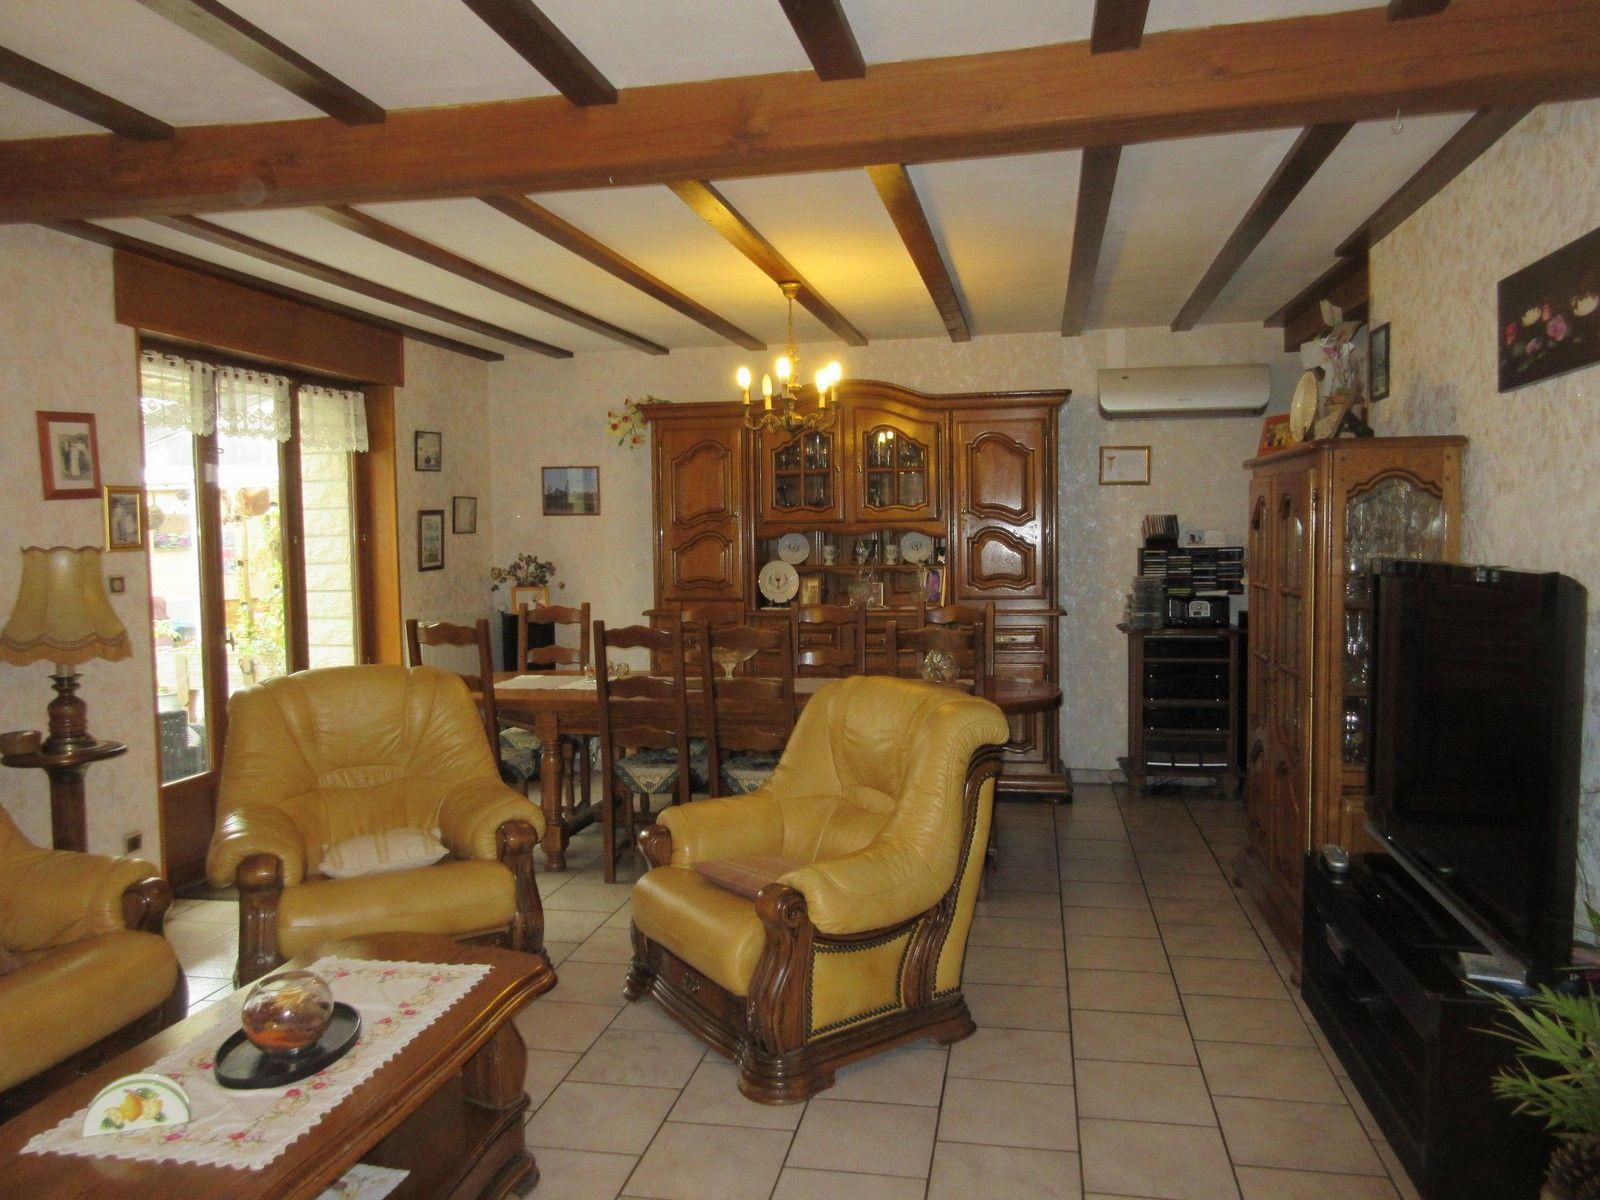 vente maison herin prix 301 000 hni ref 59175 865. Black Bedroom Furniture Sets. Home Design Ideas